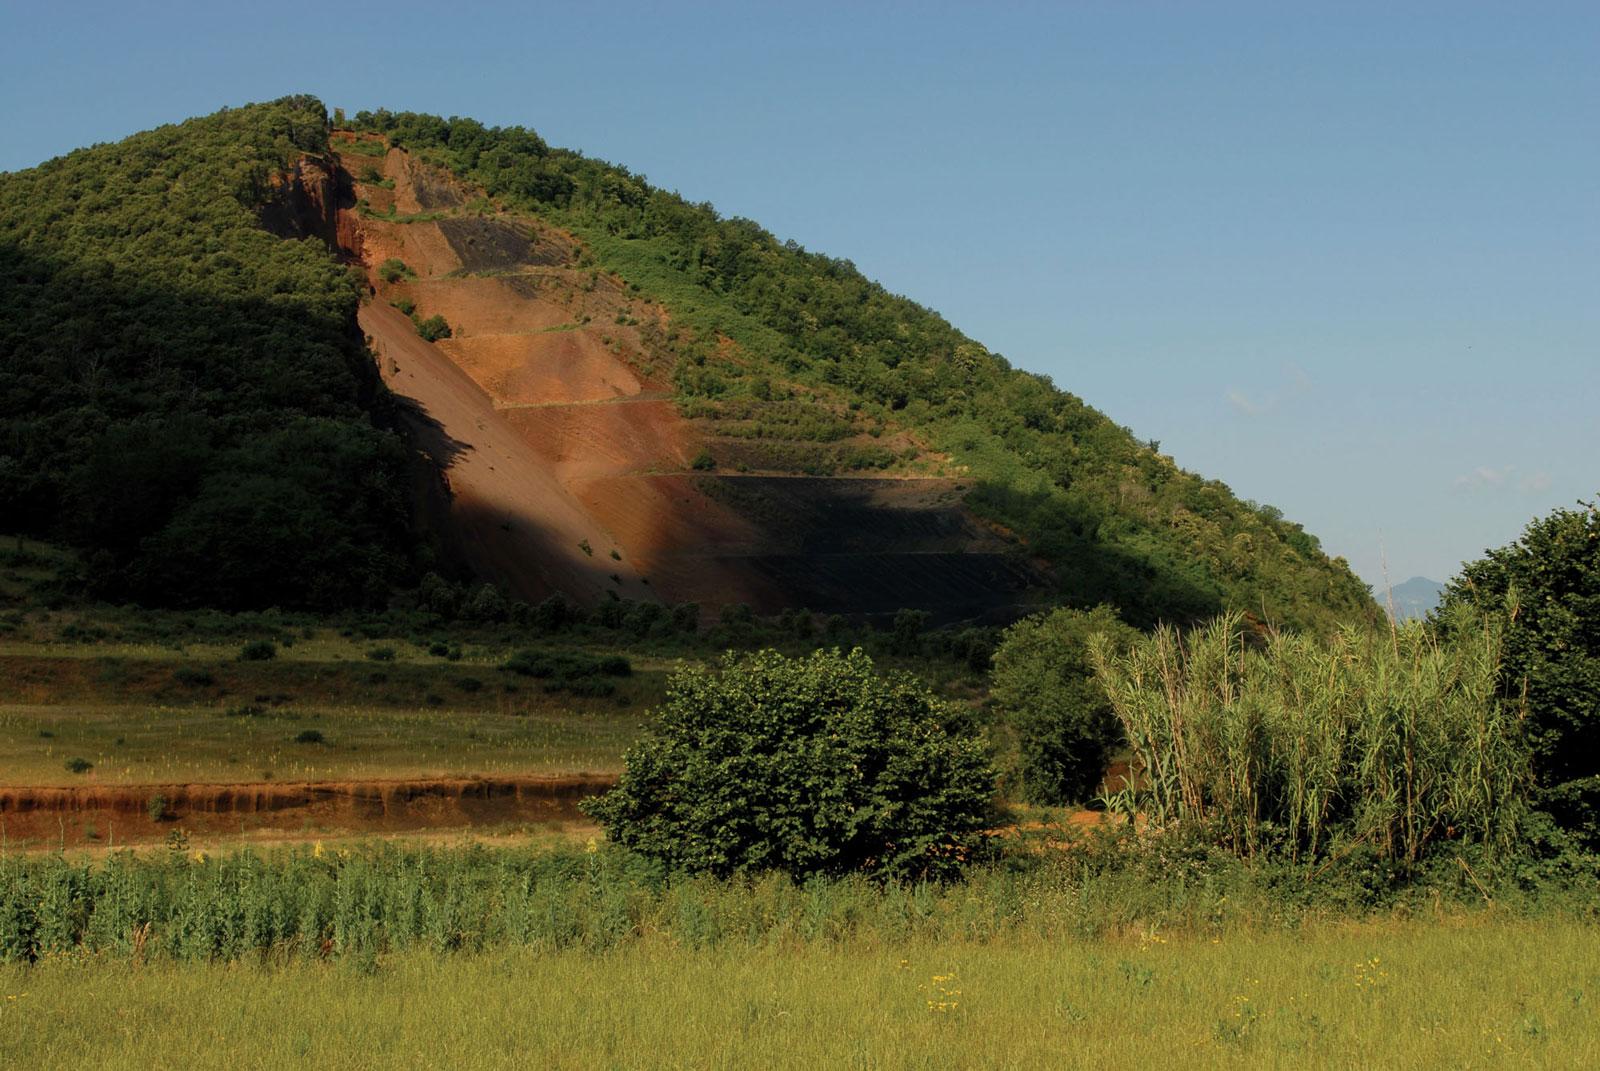 Volcan d'Olot